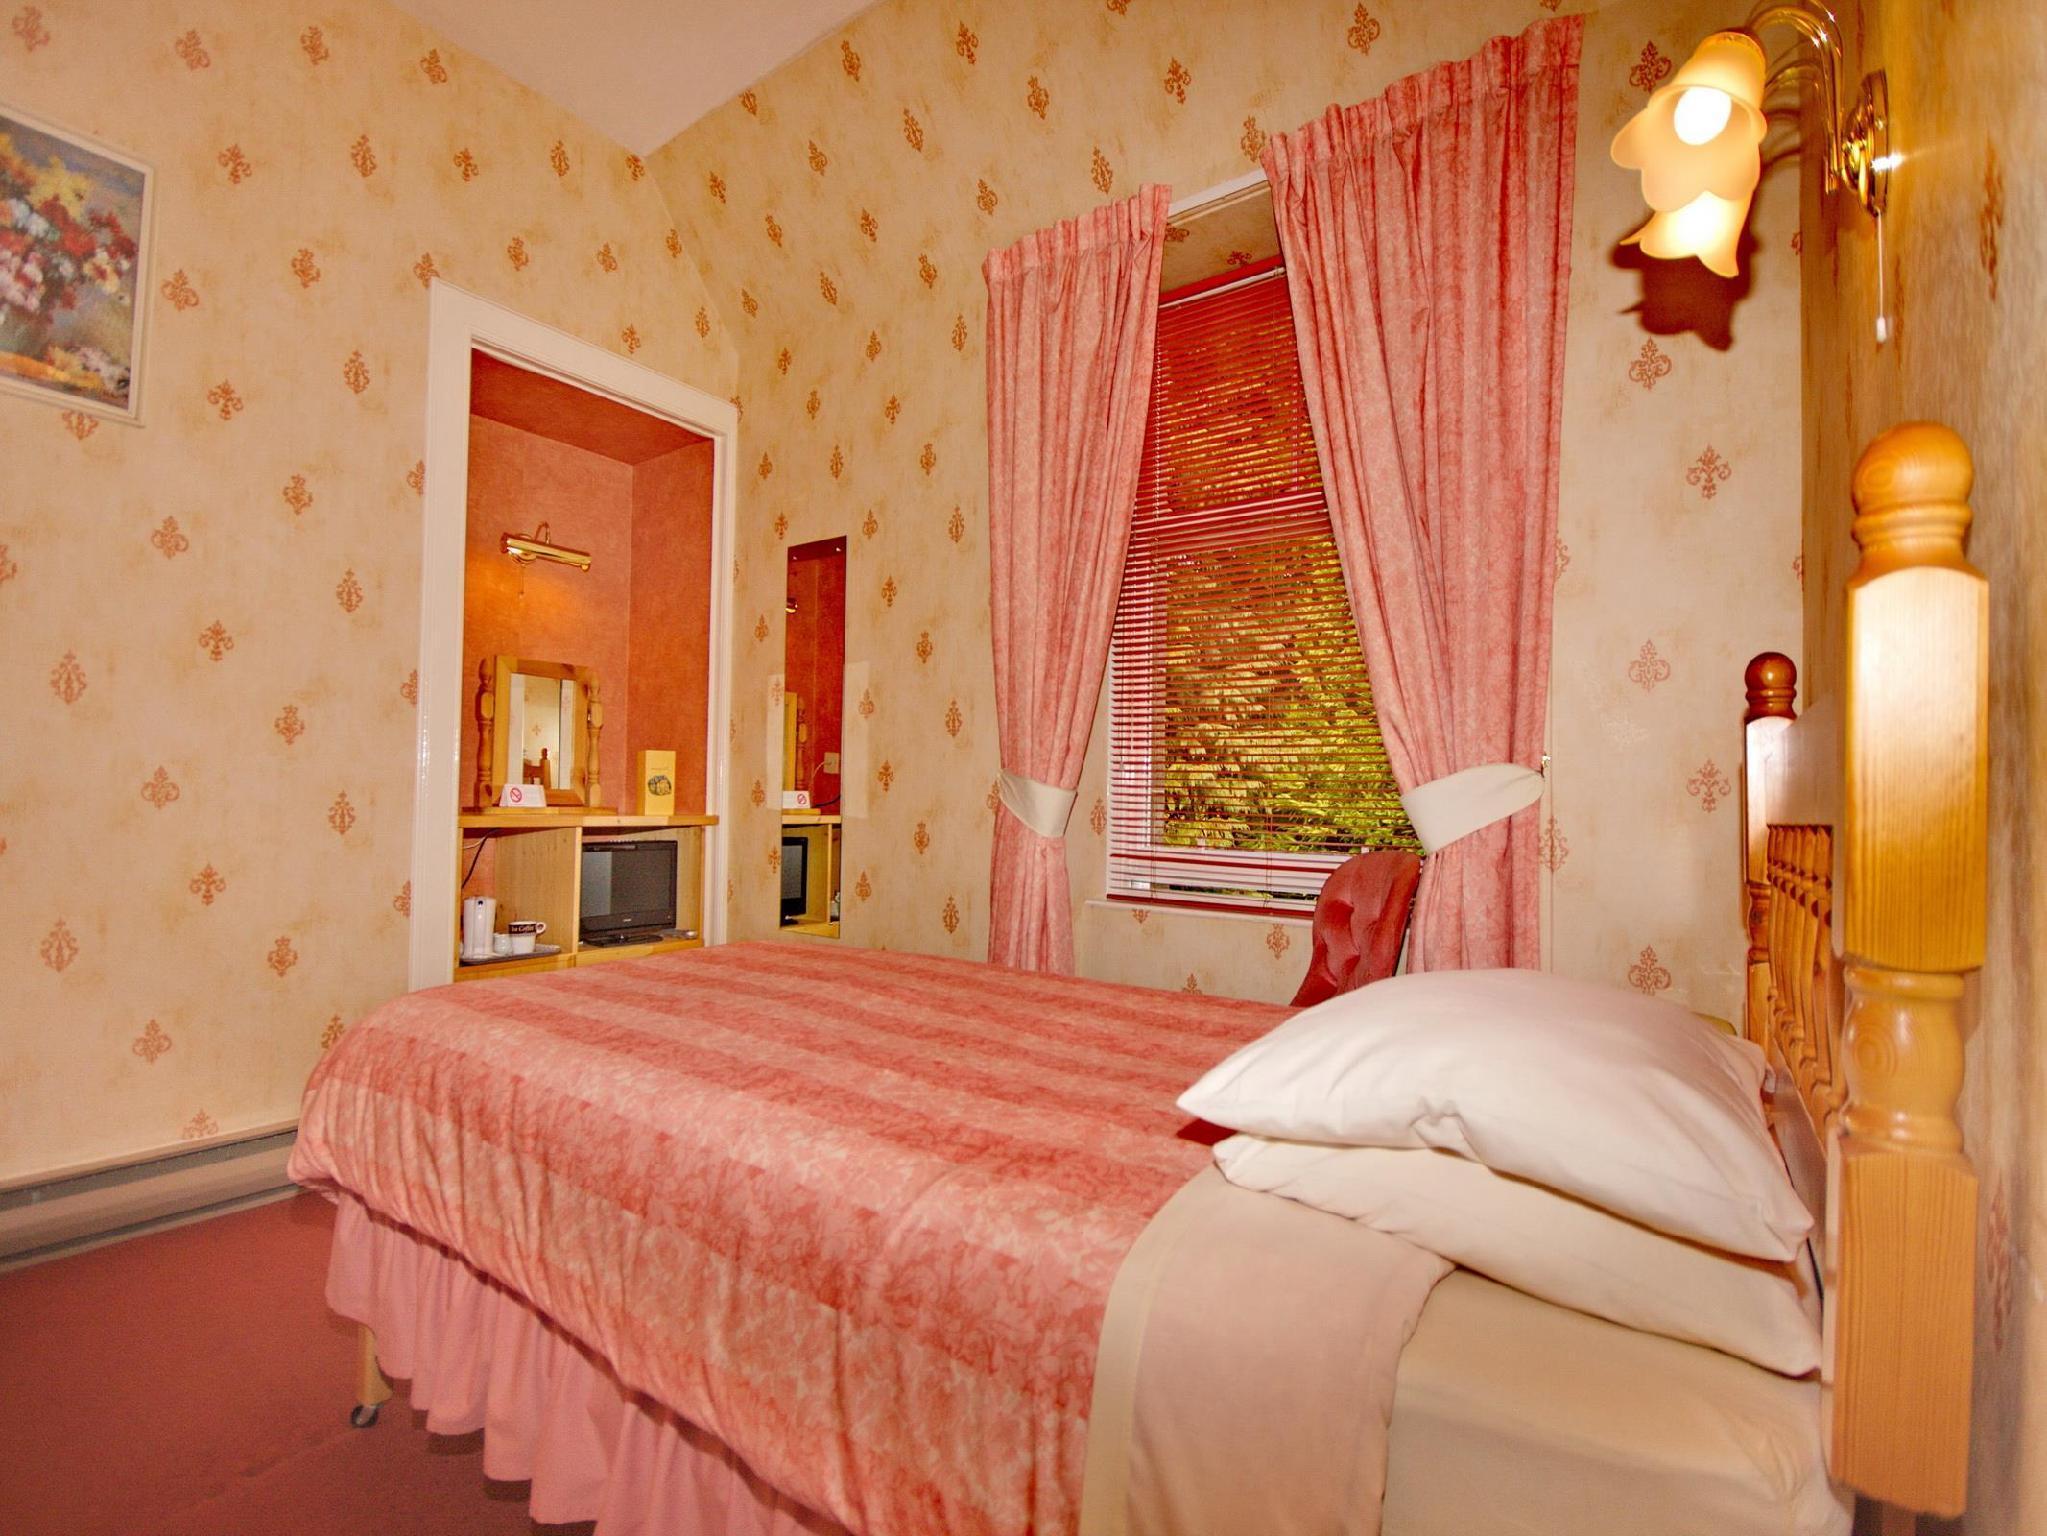 Birchwood Hotel, Perthshire and Kinross